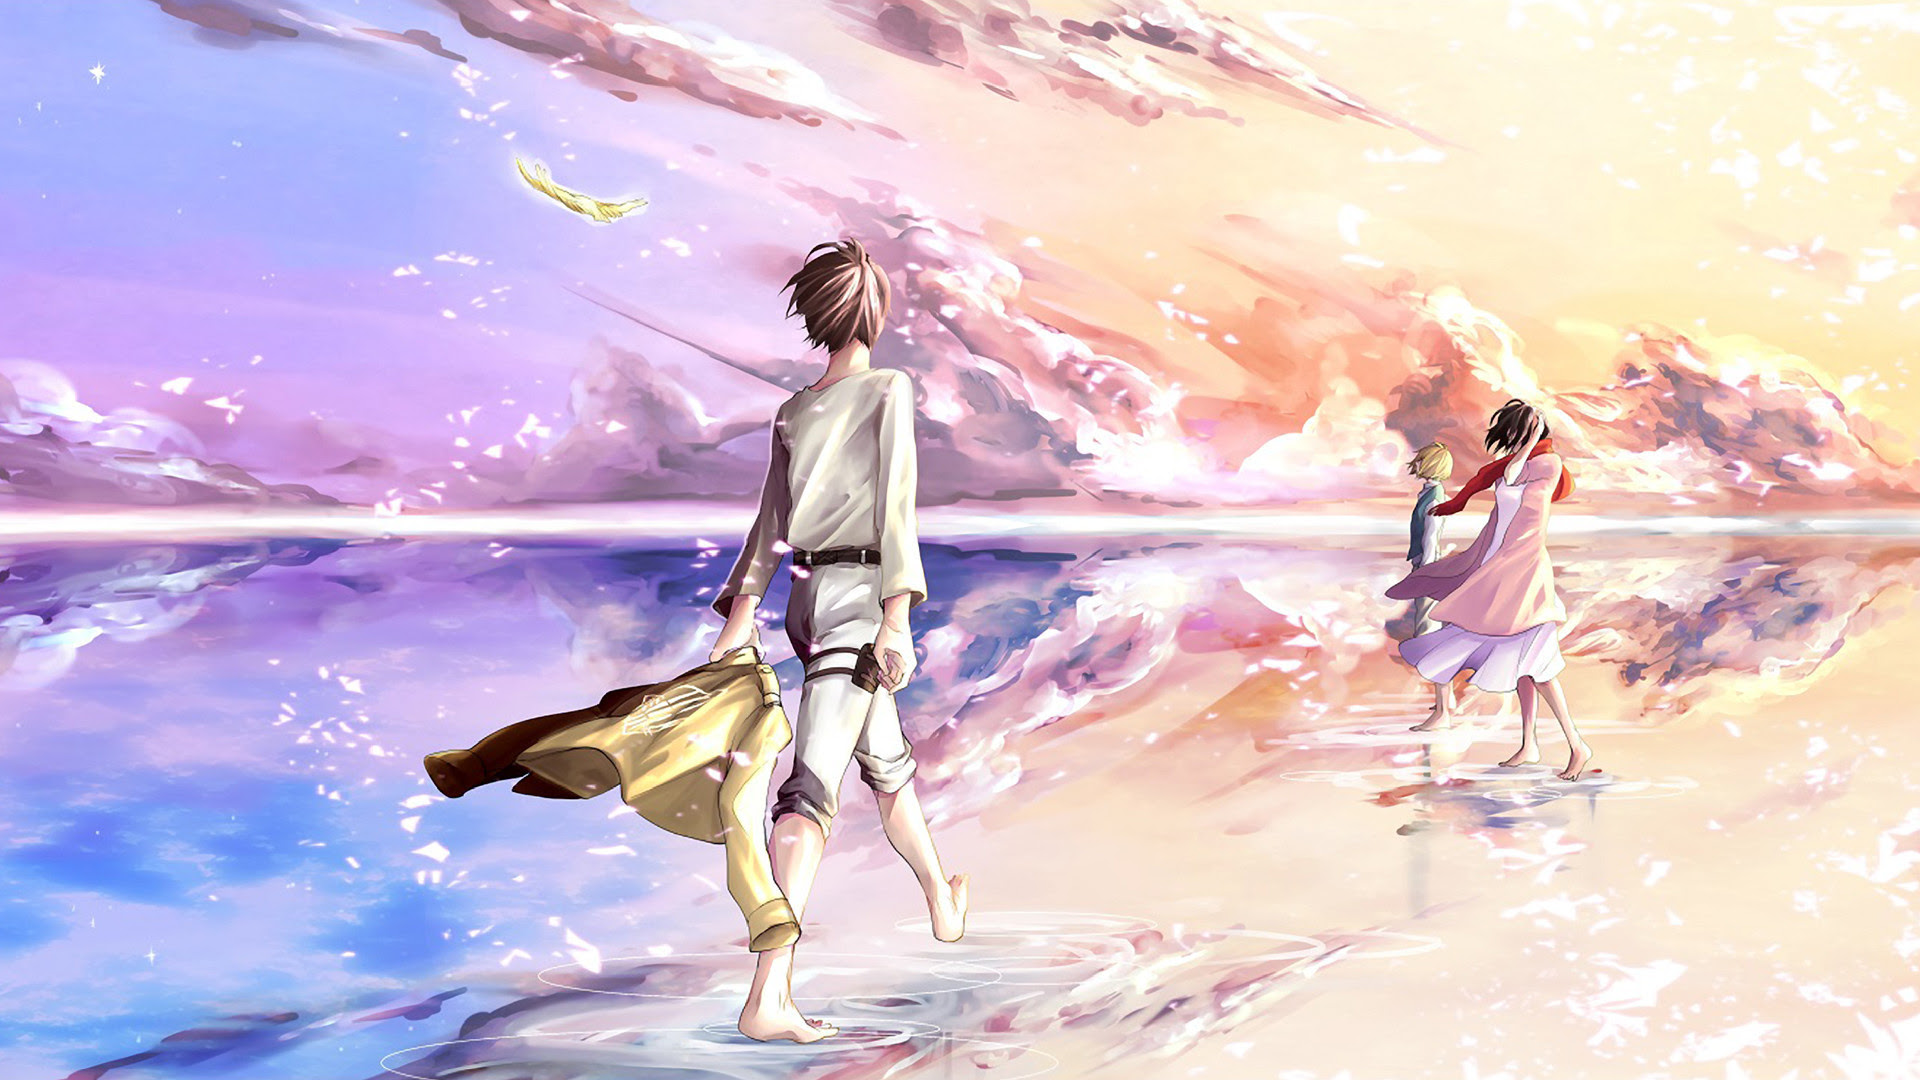 Shingeki No Kyojin Armin Fanart Dowload Anime Wallpaper Hd